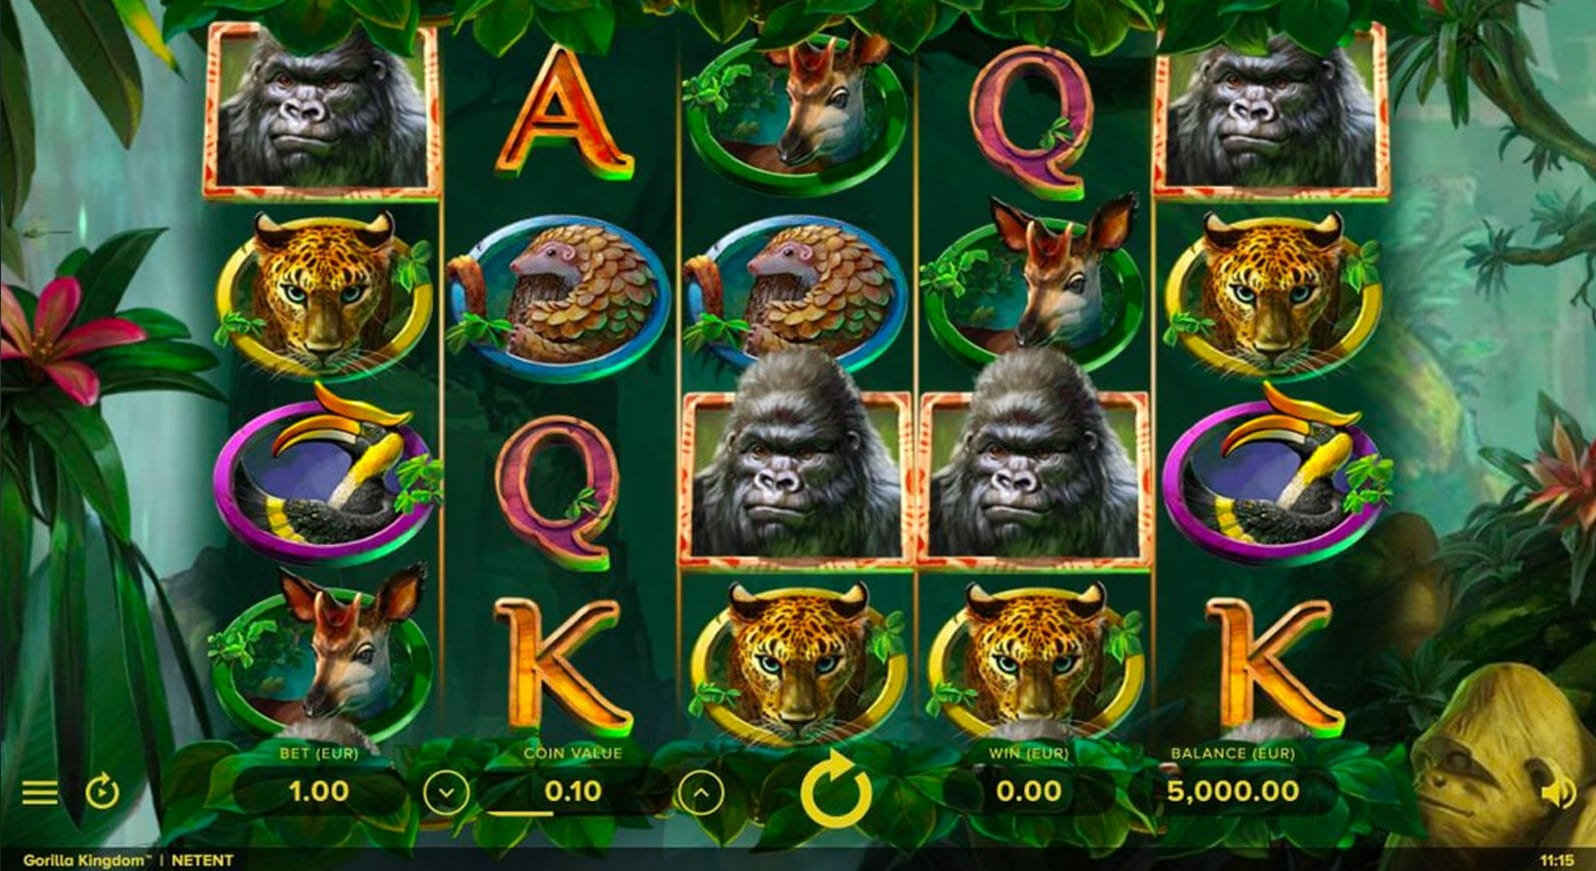 Gorilla Kingdom Slot Games Play